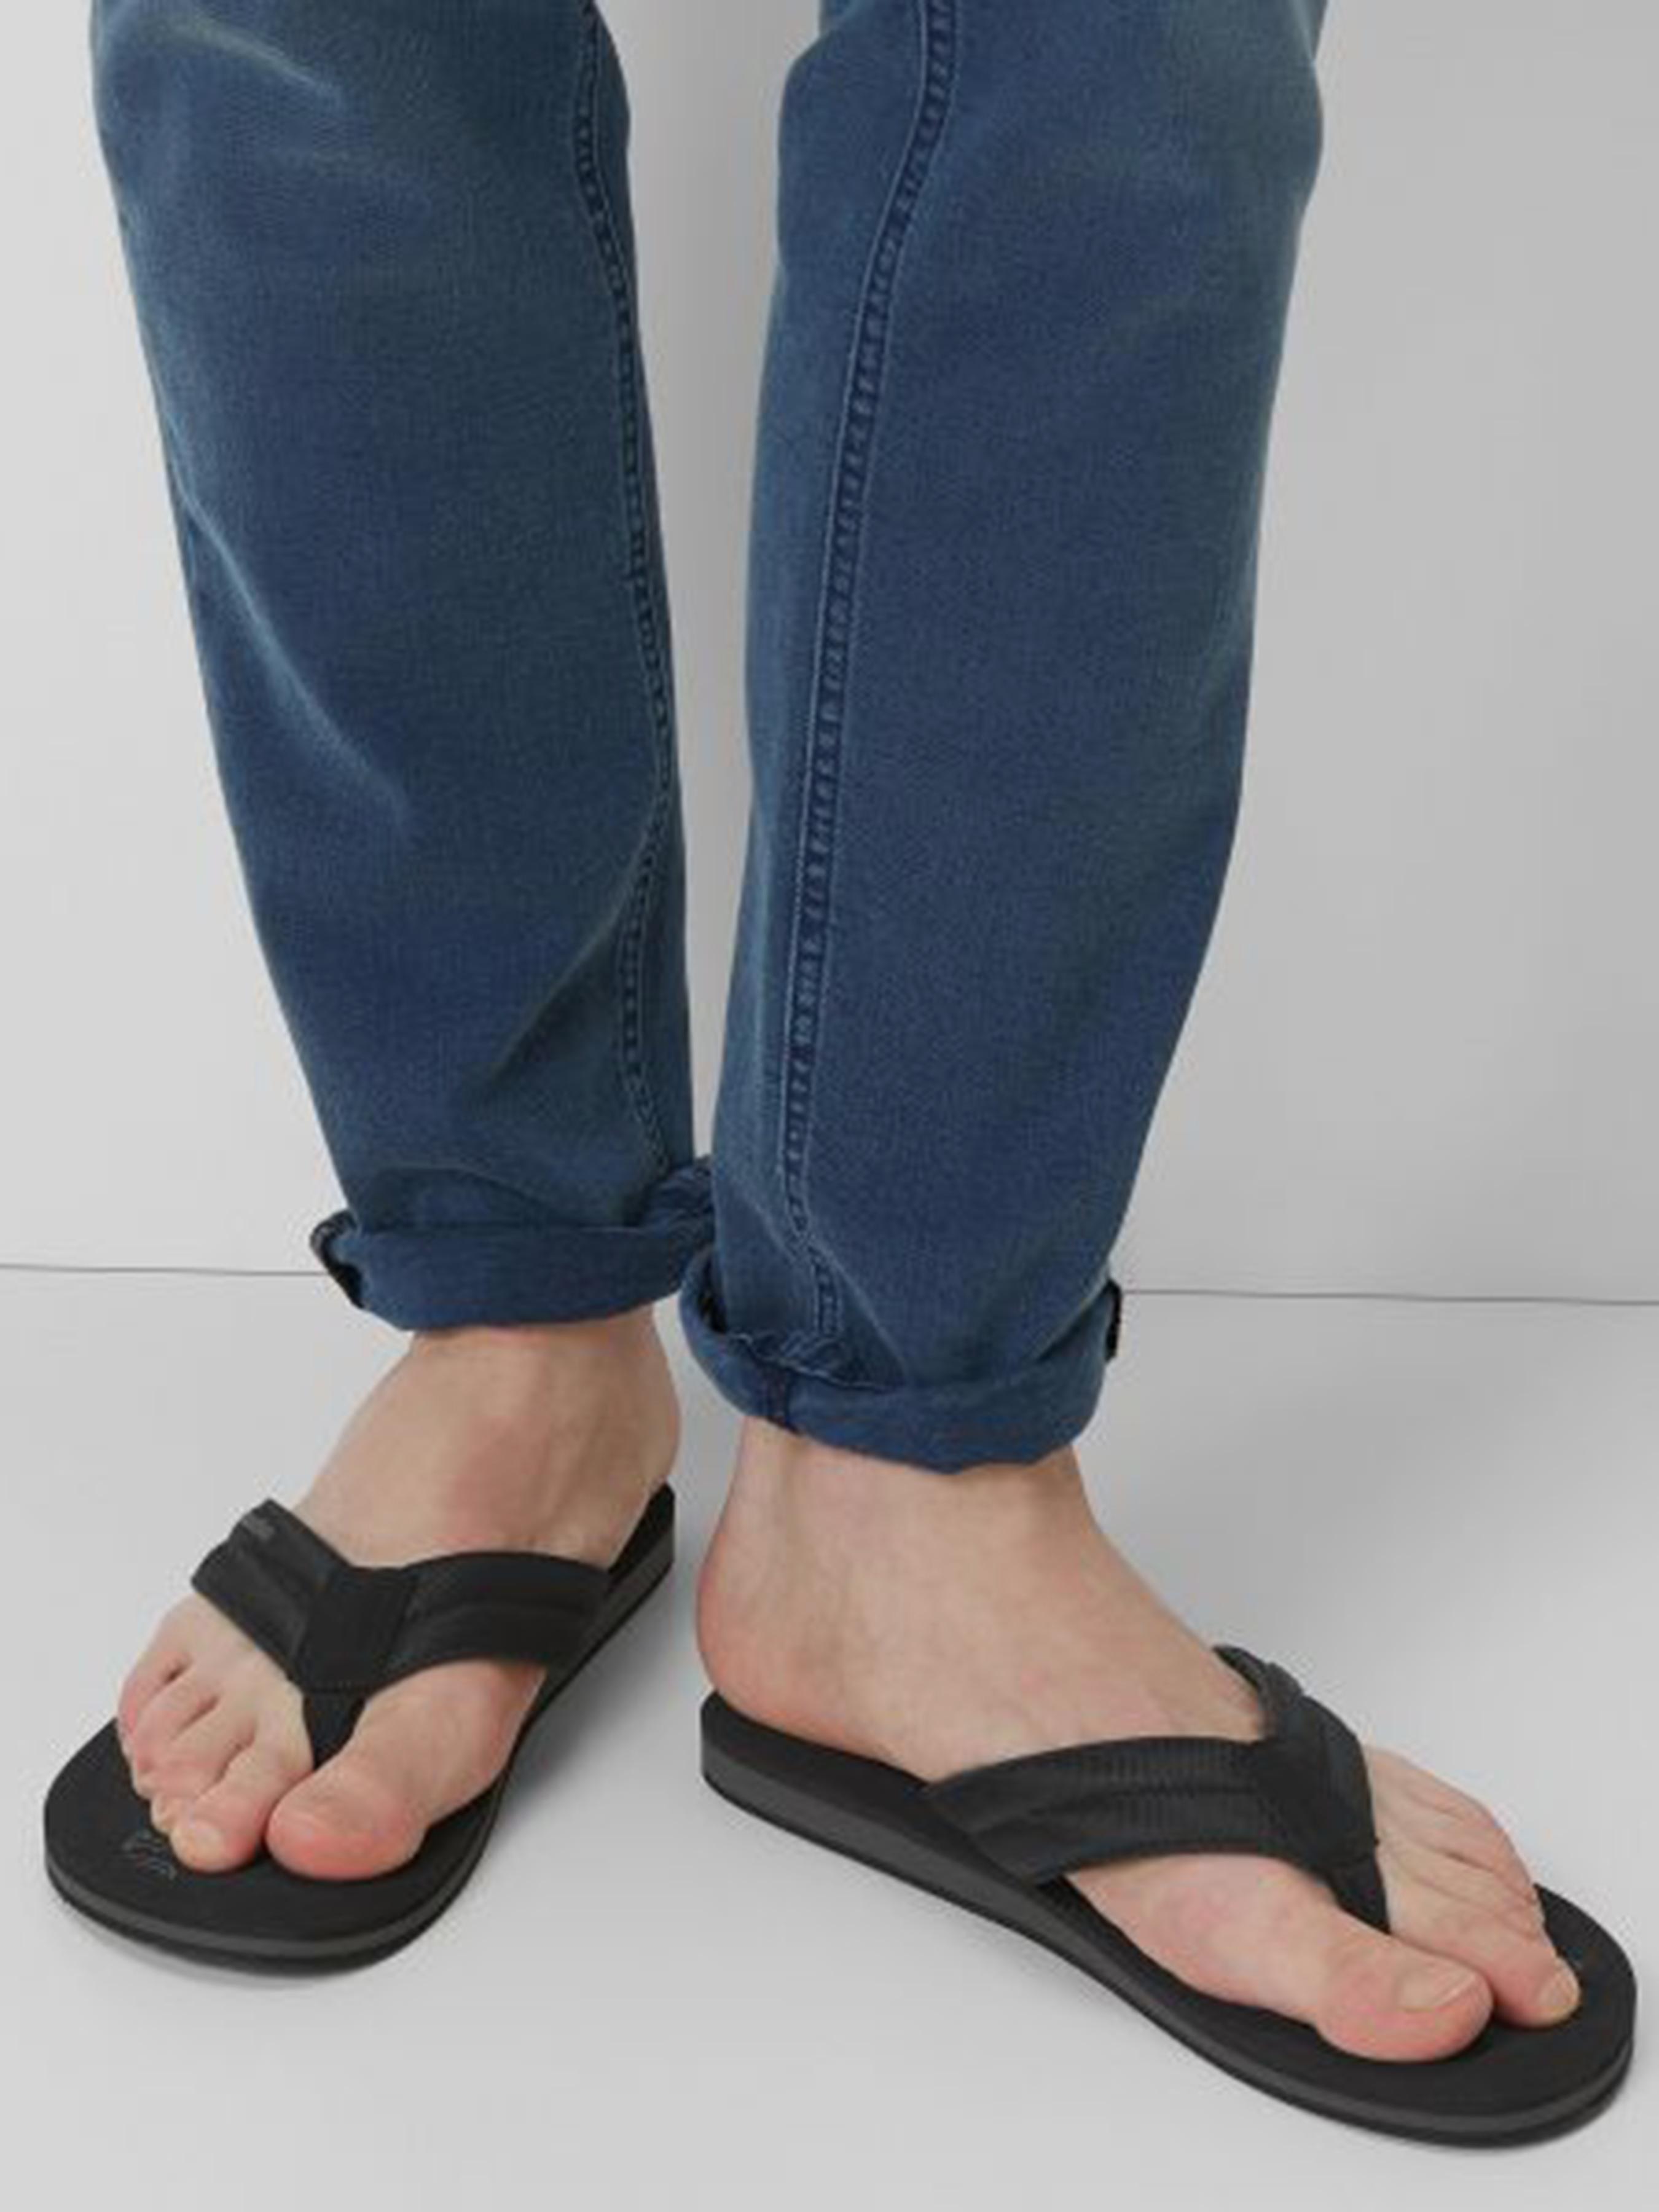 Вьетнамки мужские MARC O'POLO PO378 купить обувь, 2017